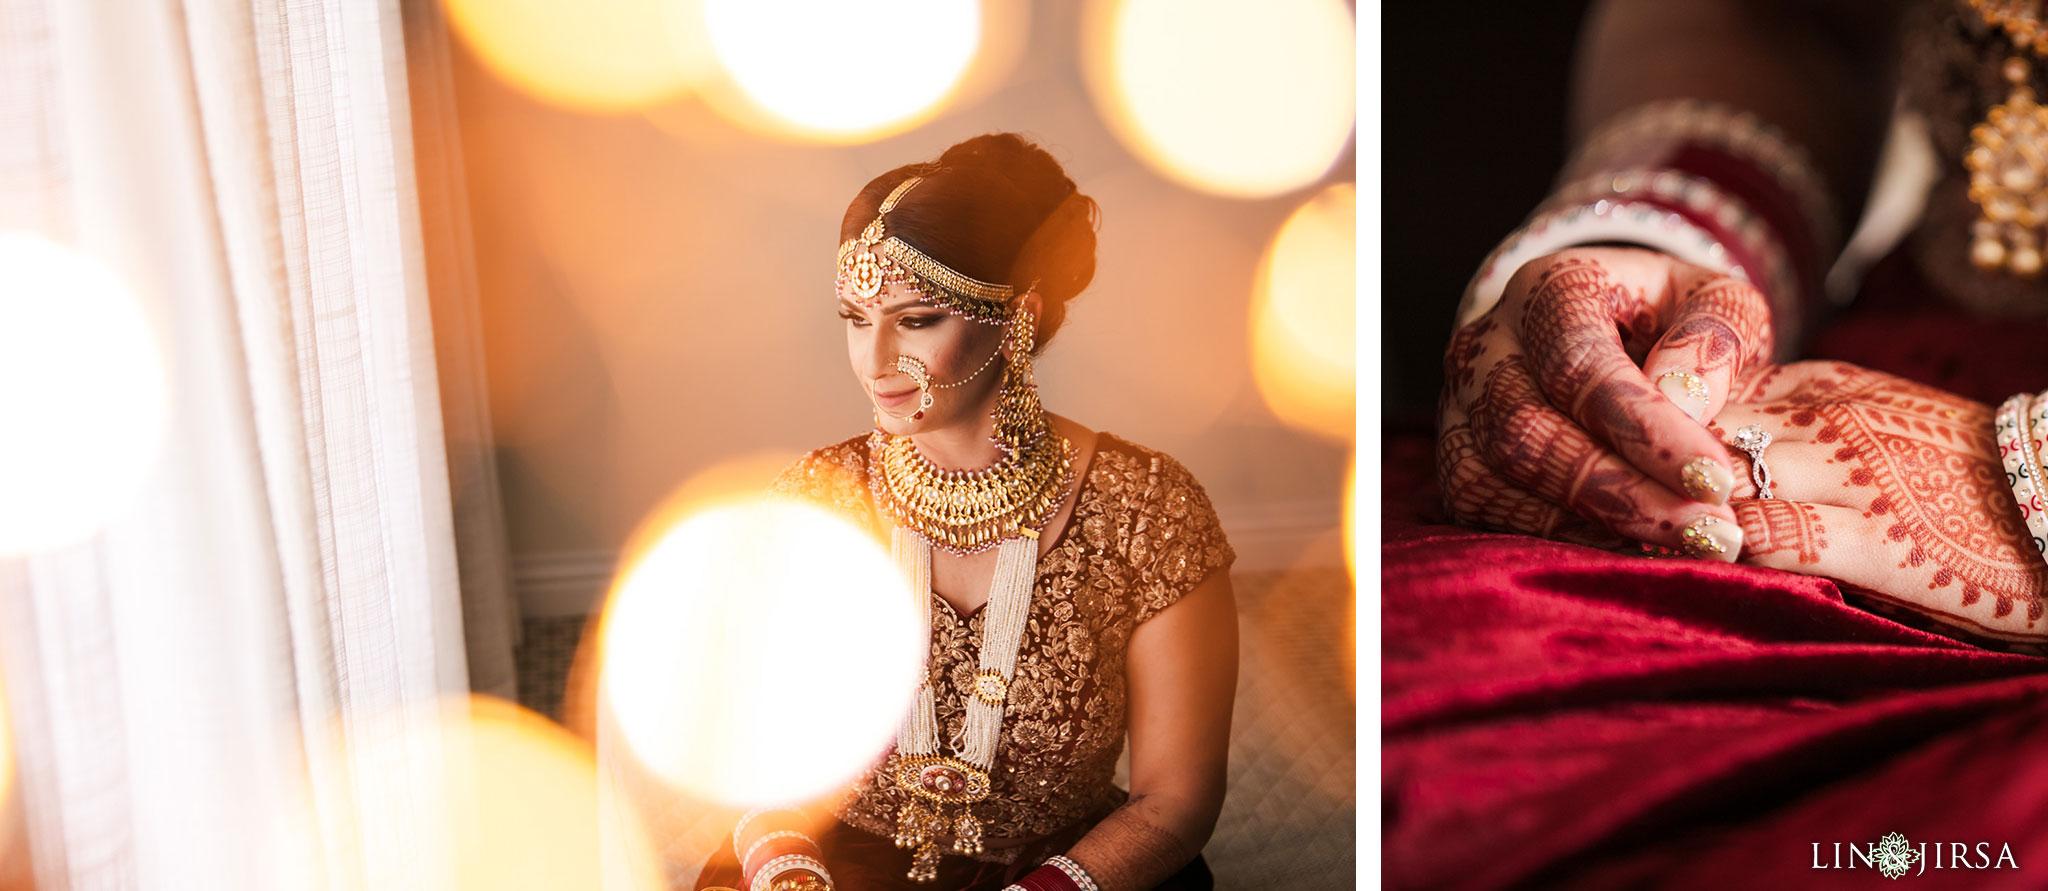 003 monarch beach resort dana point indian bride wedding photography